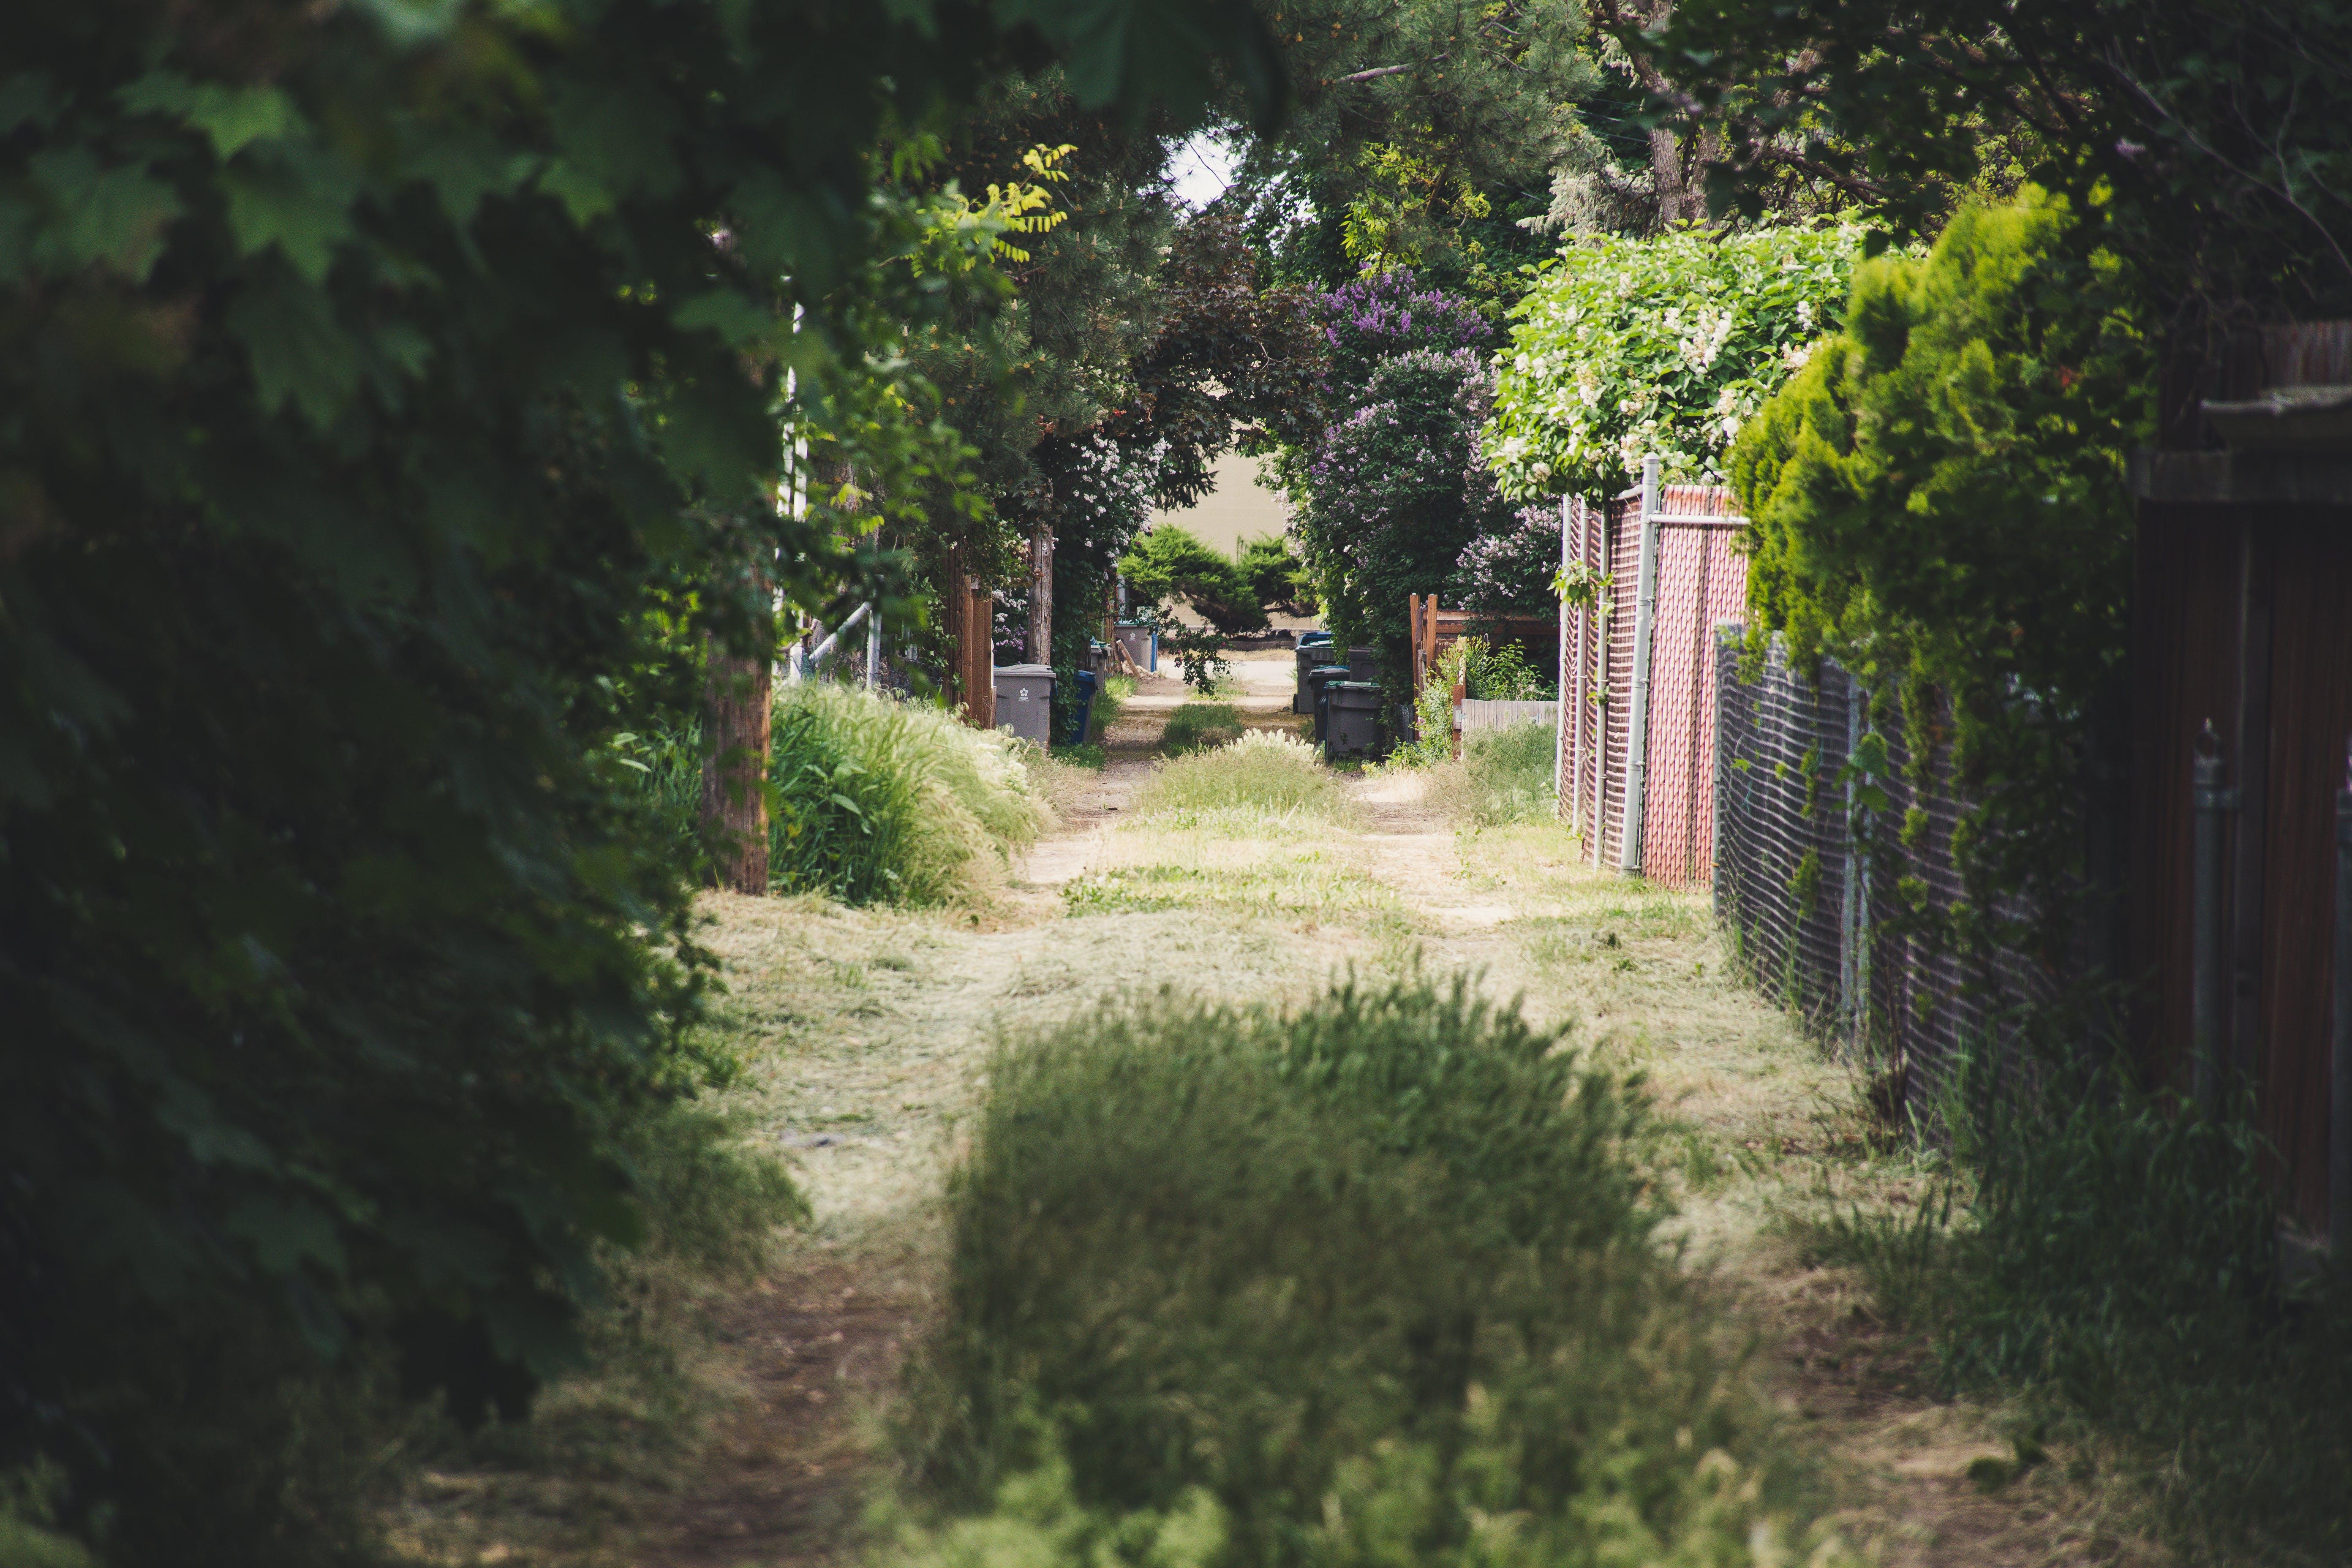 Green Grass Field Pathway